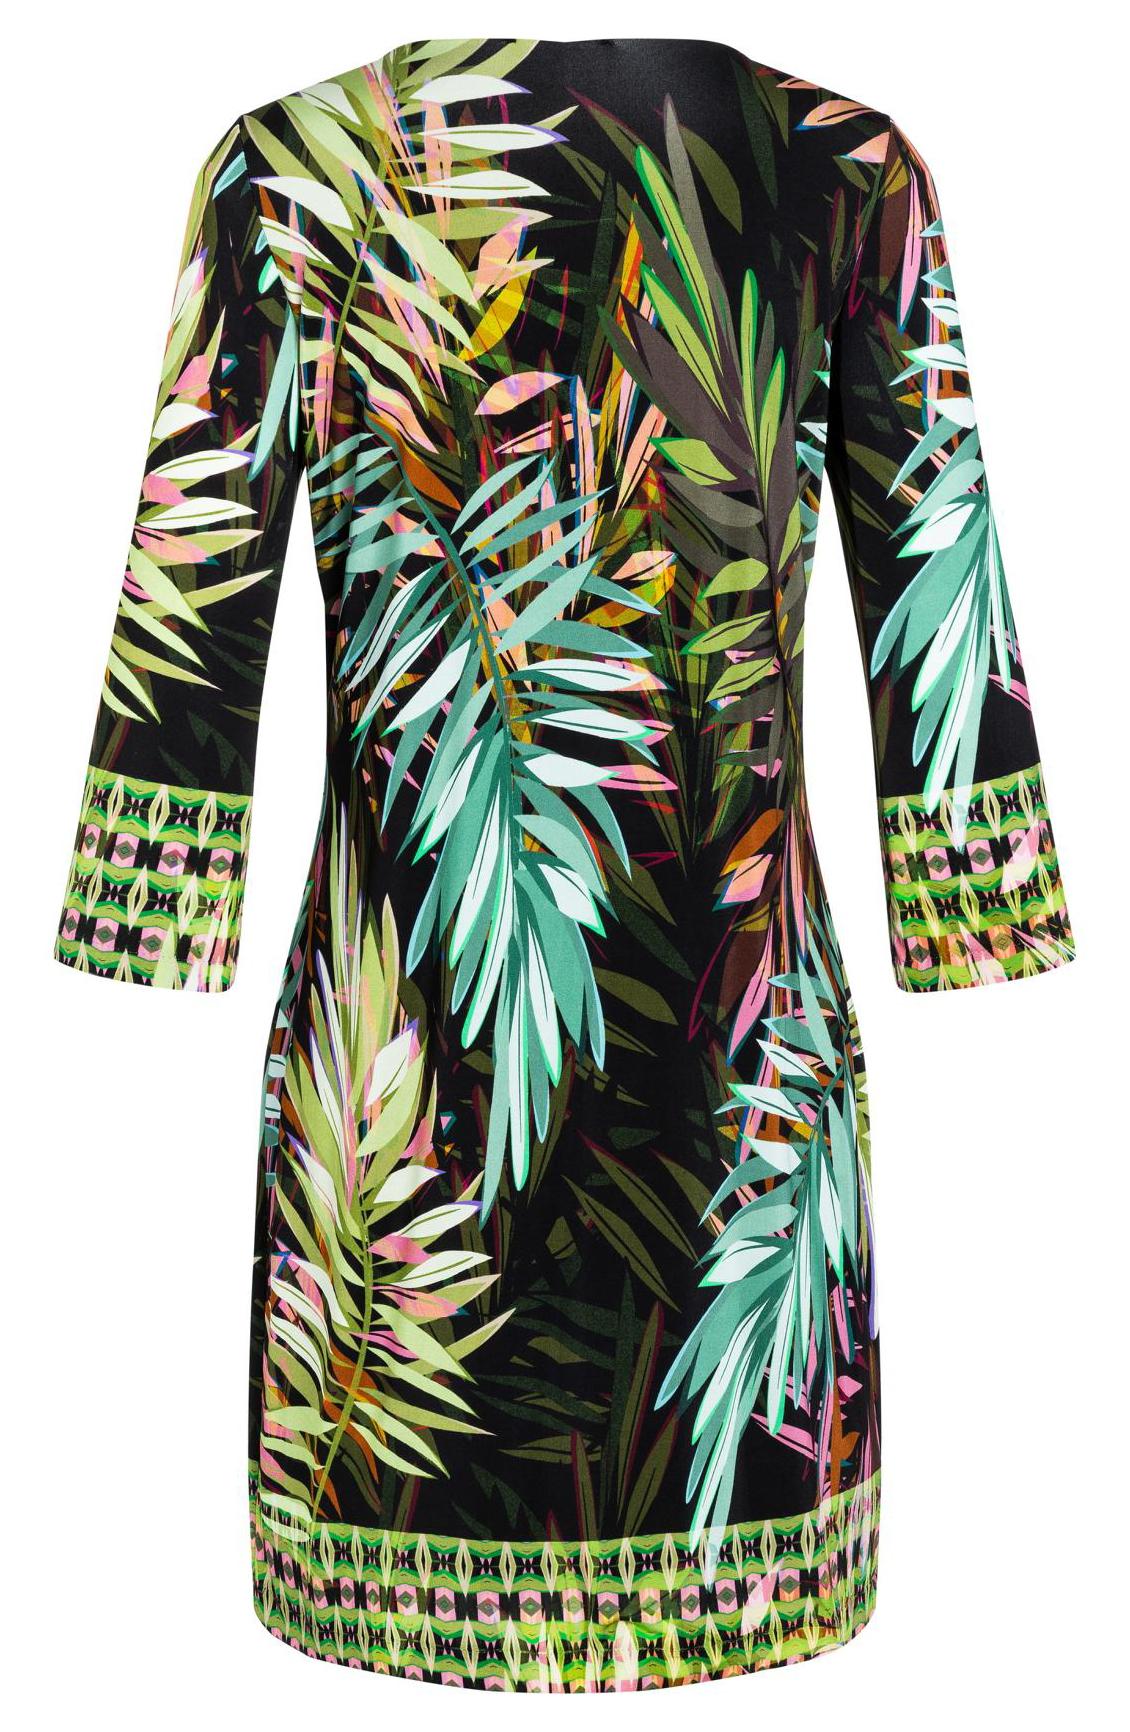 Ana Alcazar Dames Jurk met jungle print groen